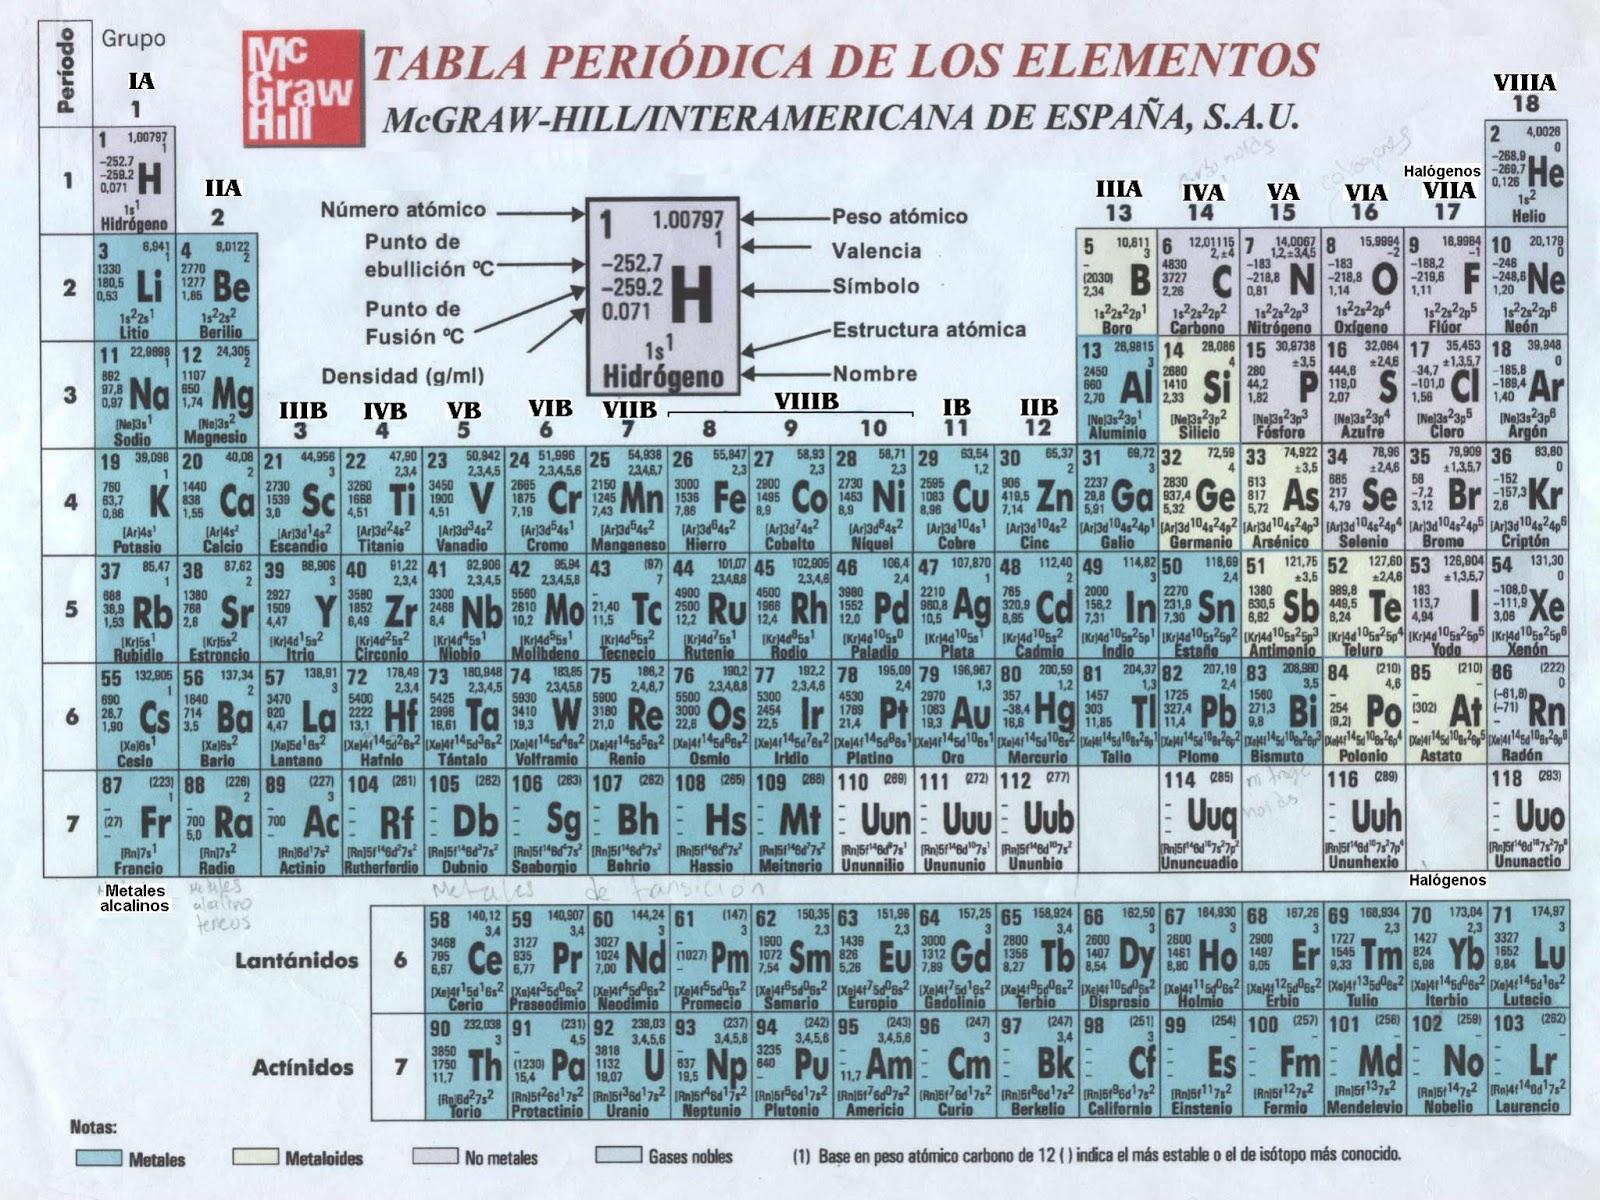 Secundaria tareas tabla periodica tabla periodica publicado por secundariatareas en 1546 urtaz Choice Image